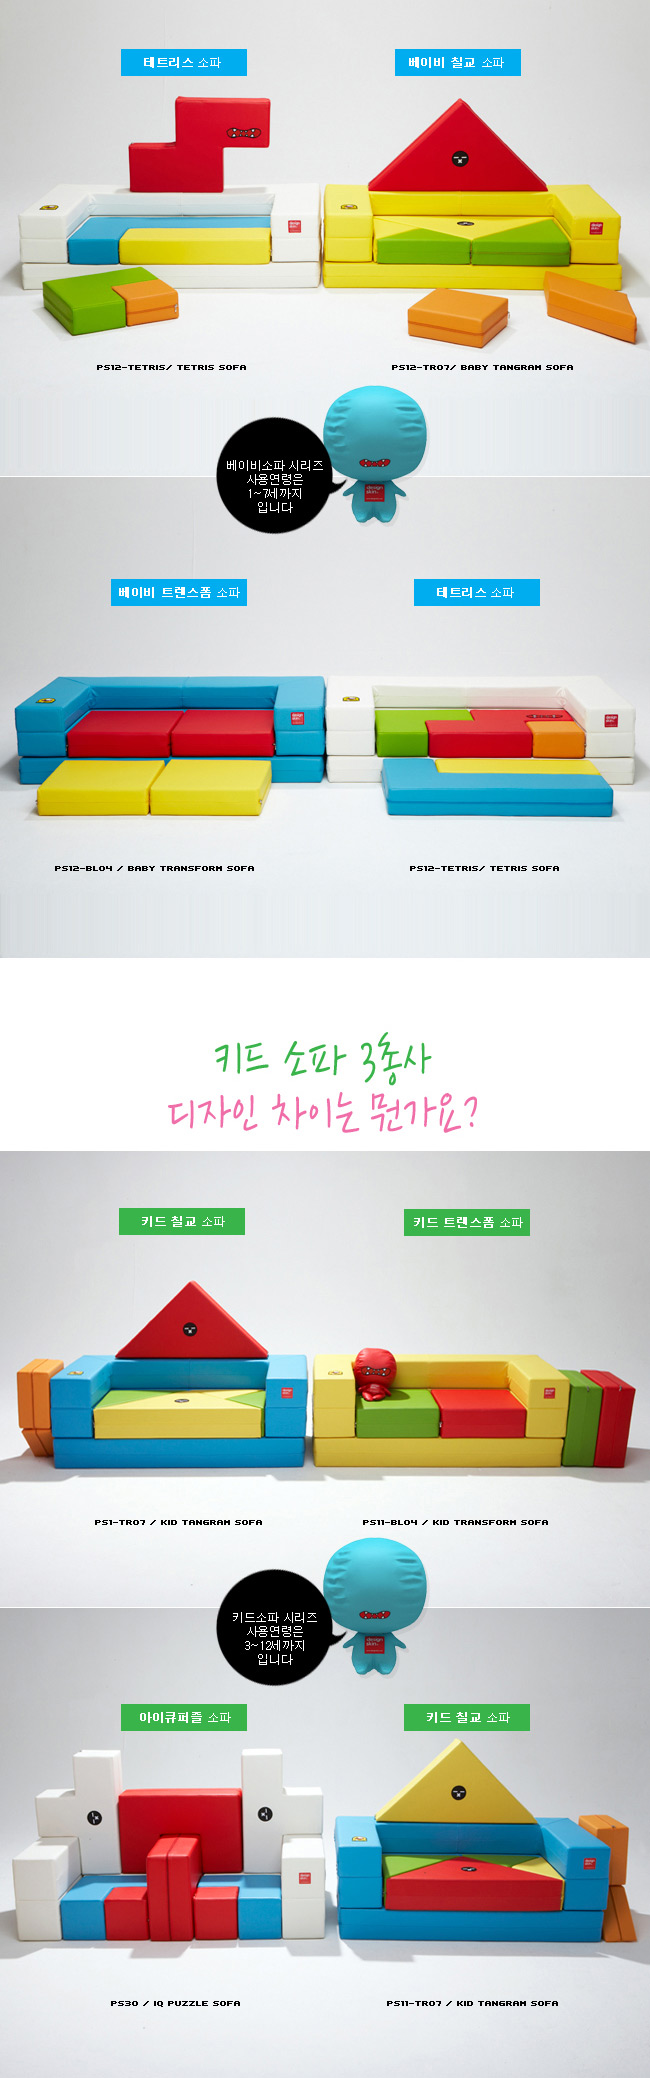 PS30: IQ Puzzle Sofa by Designskin | детский интерьер | Pinterest ...